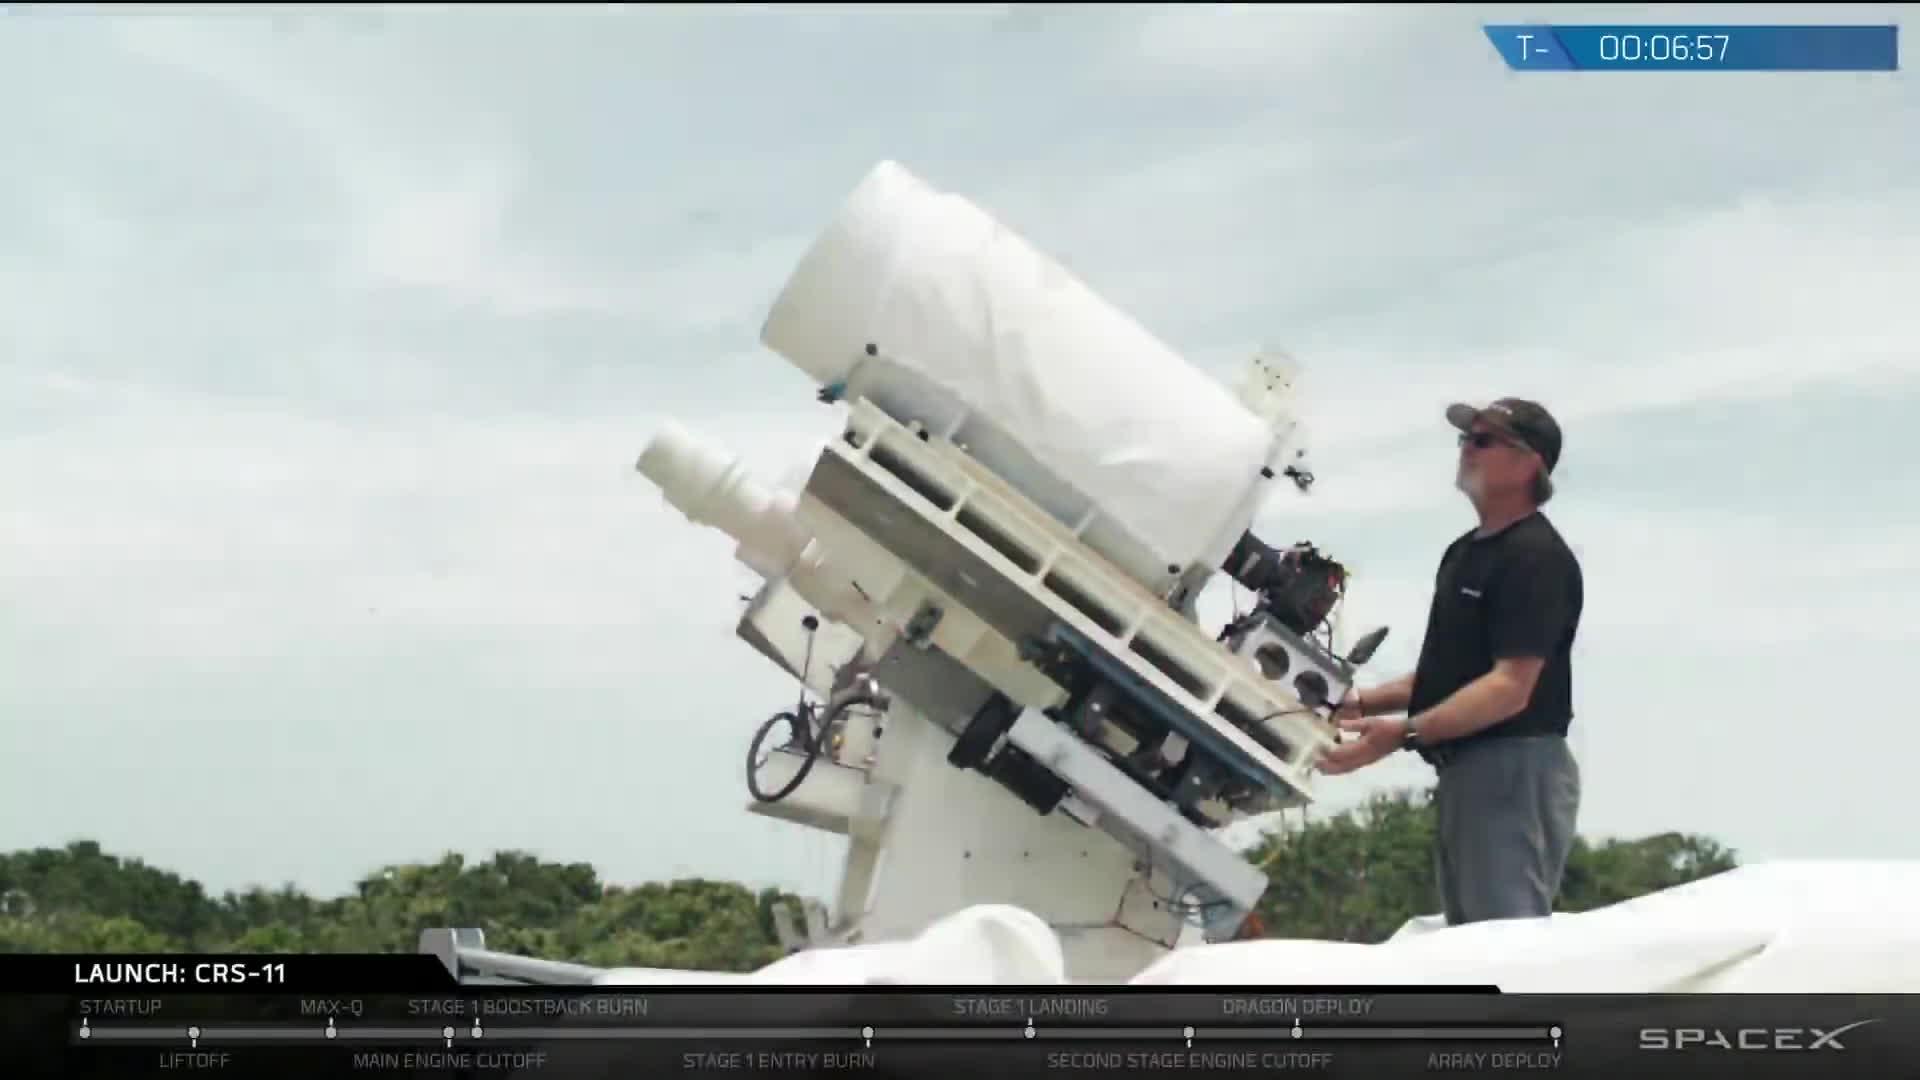 camera, sapcex, telescopw, Spacex camera GIFs